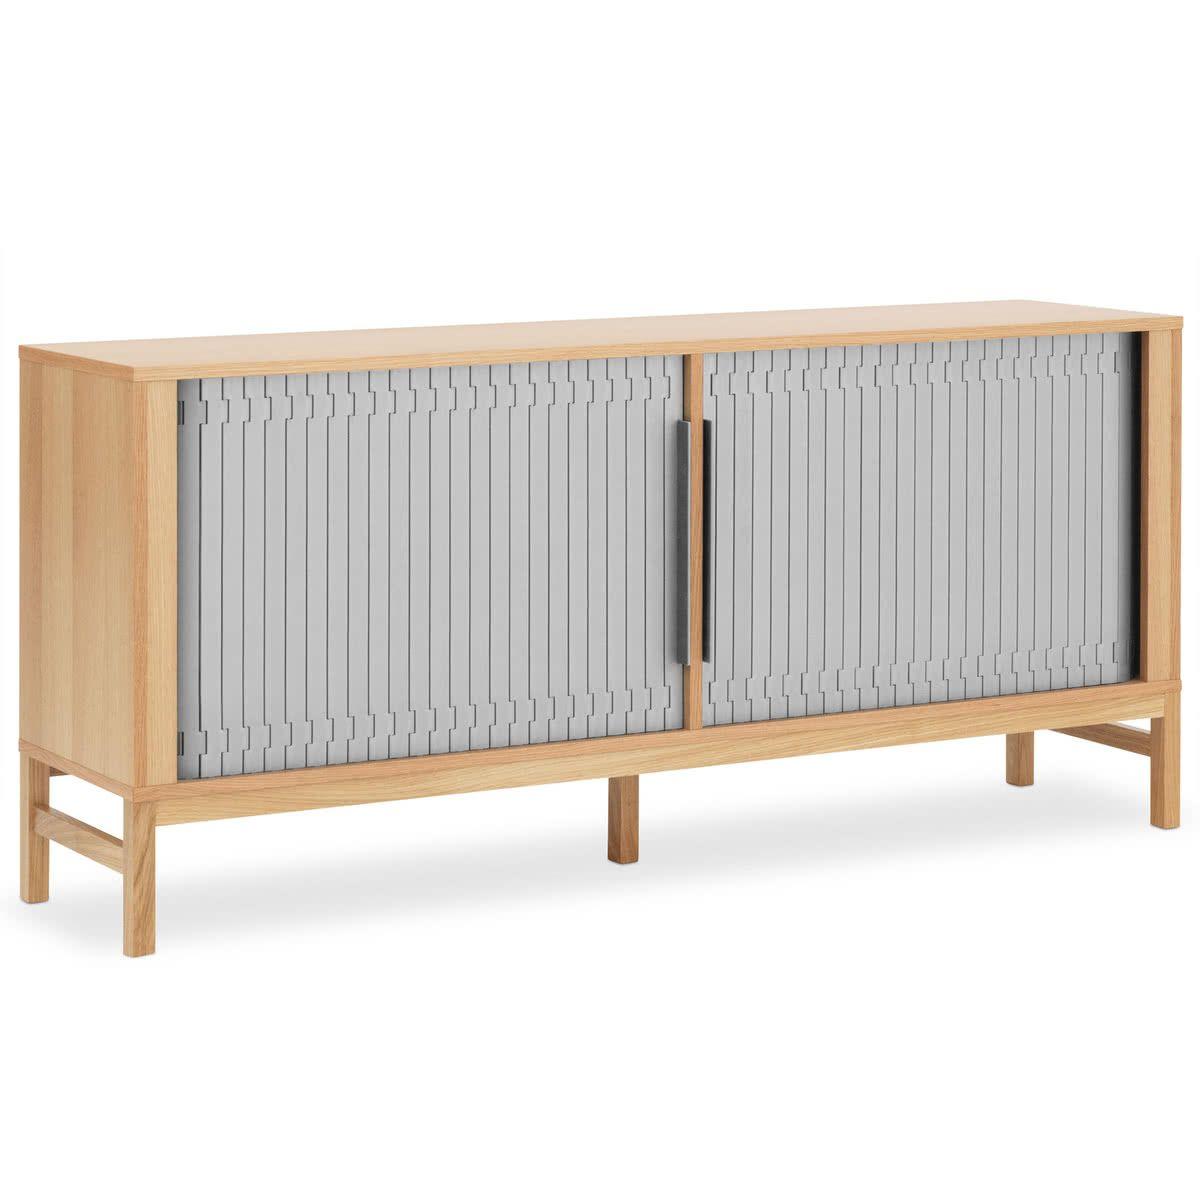 135cm Dann Sideboard Grau Mit Bildern Sideboard Grau